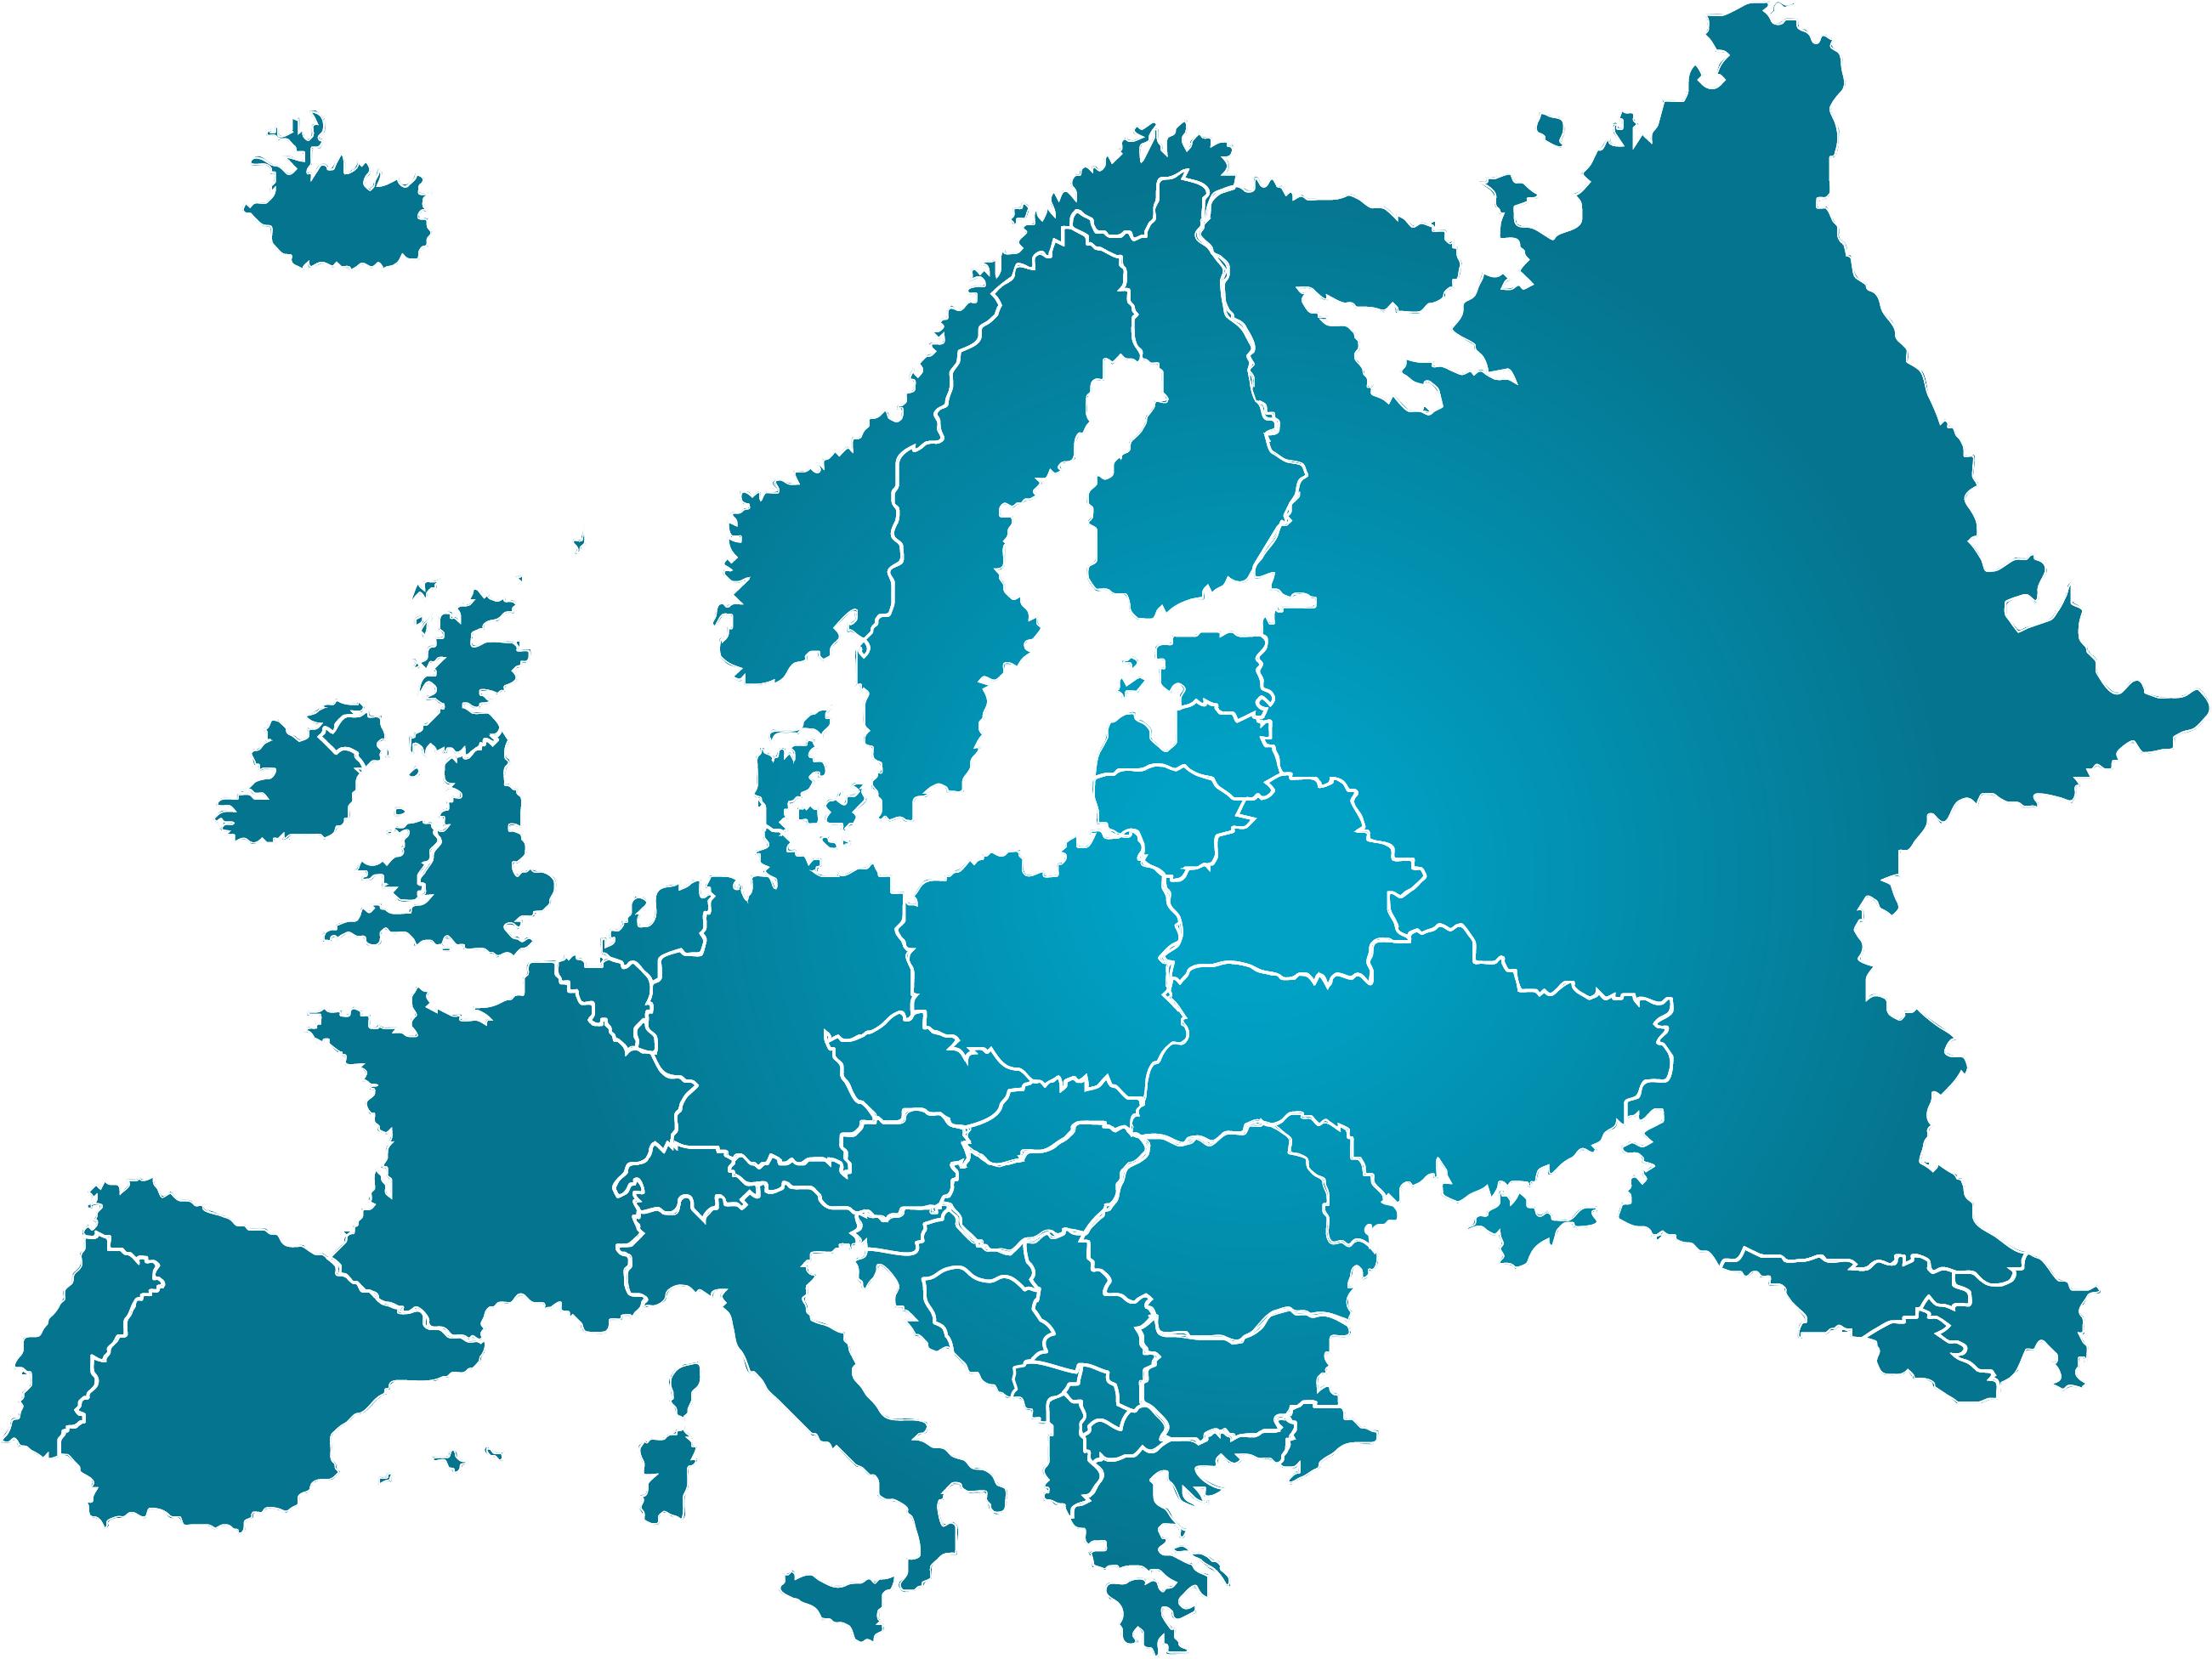 Karte Eu.Jsc Sominis Technology Wholesale Distribution